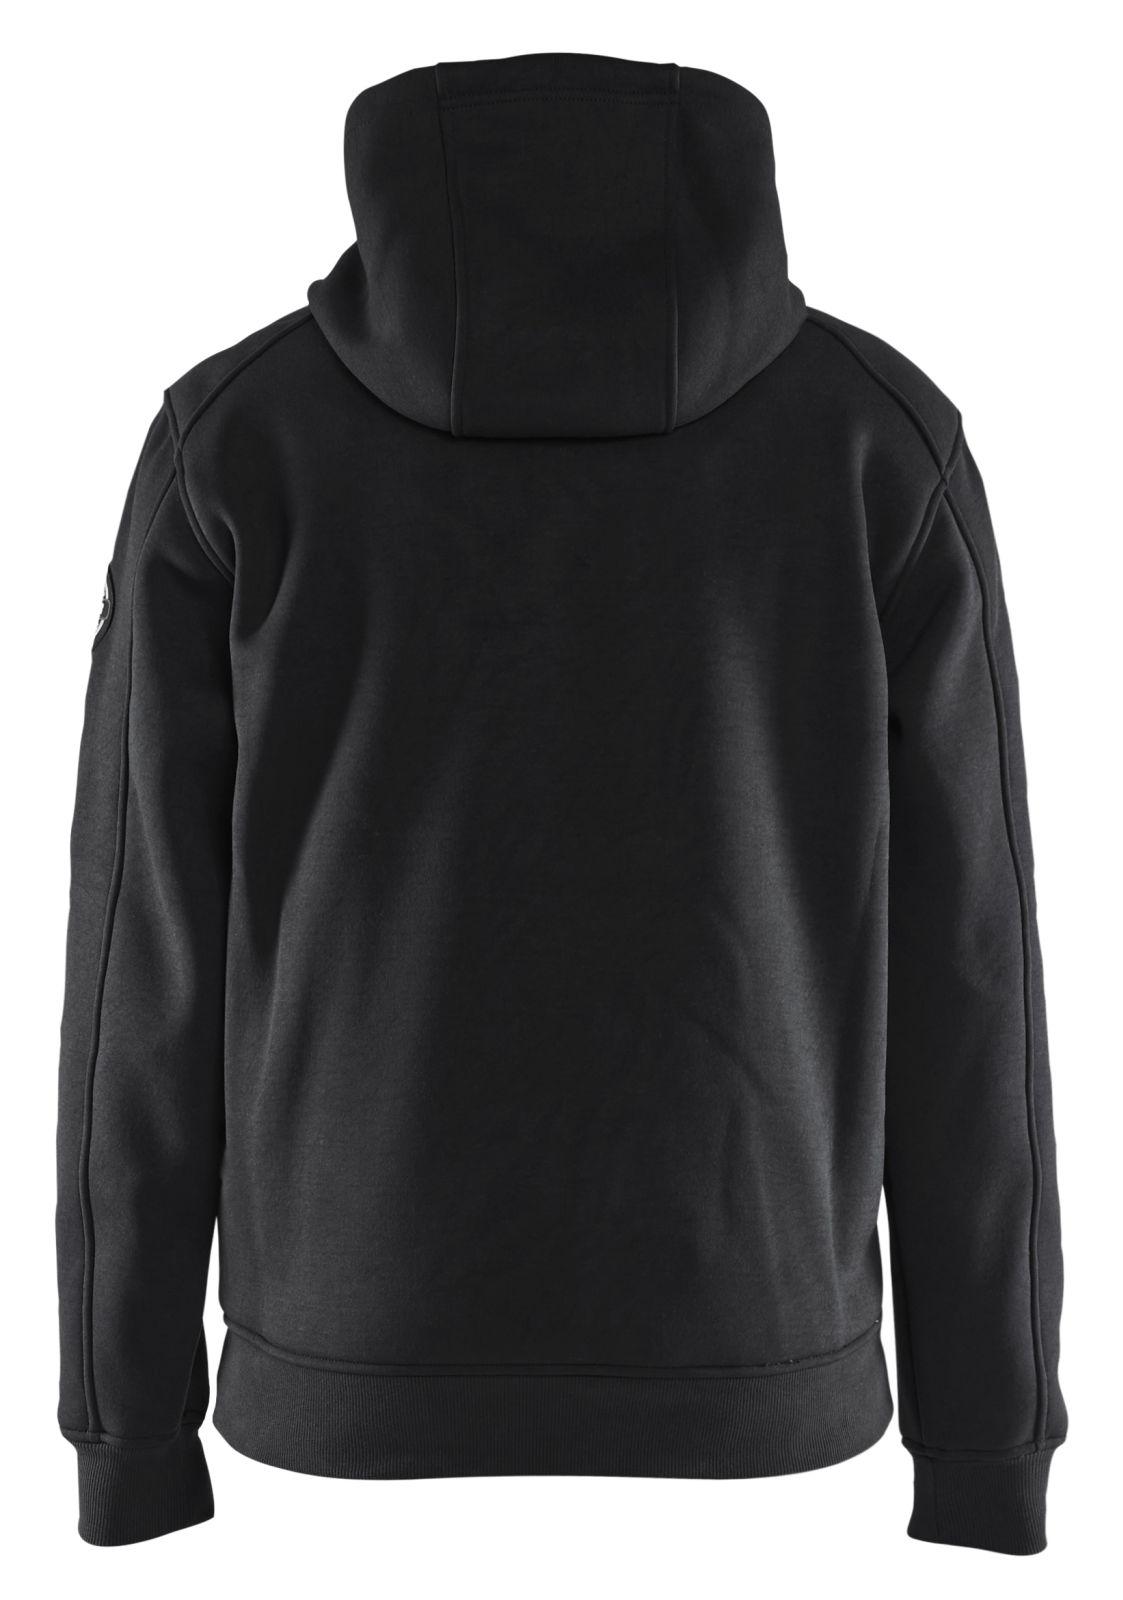 Blaklader Hooded sweatvesten 49332514 zwart(9900)